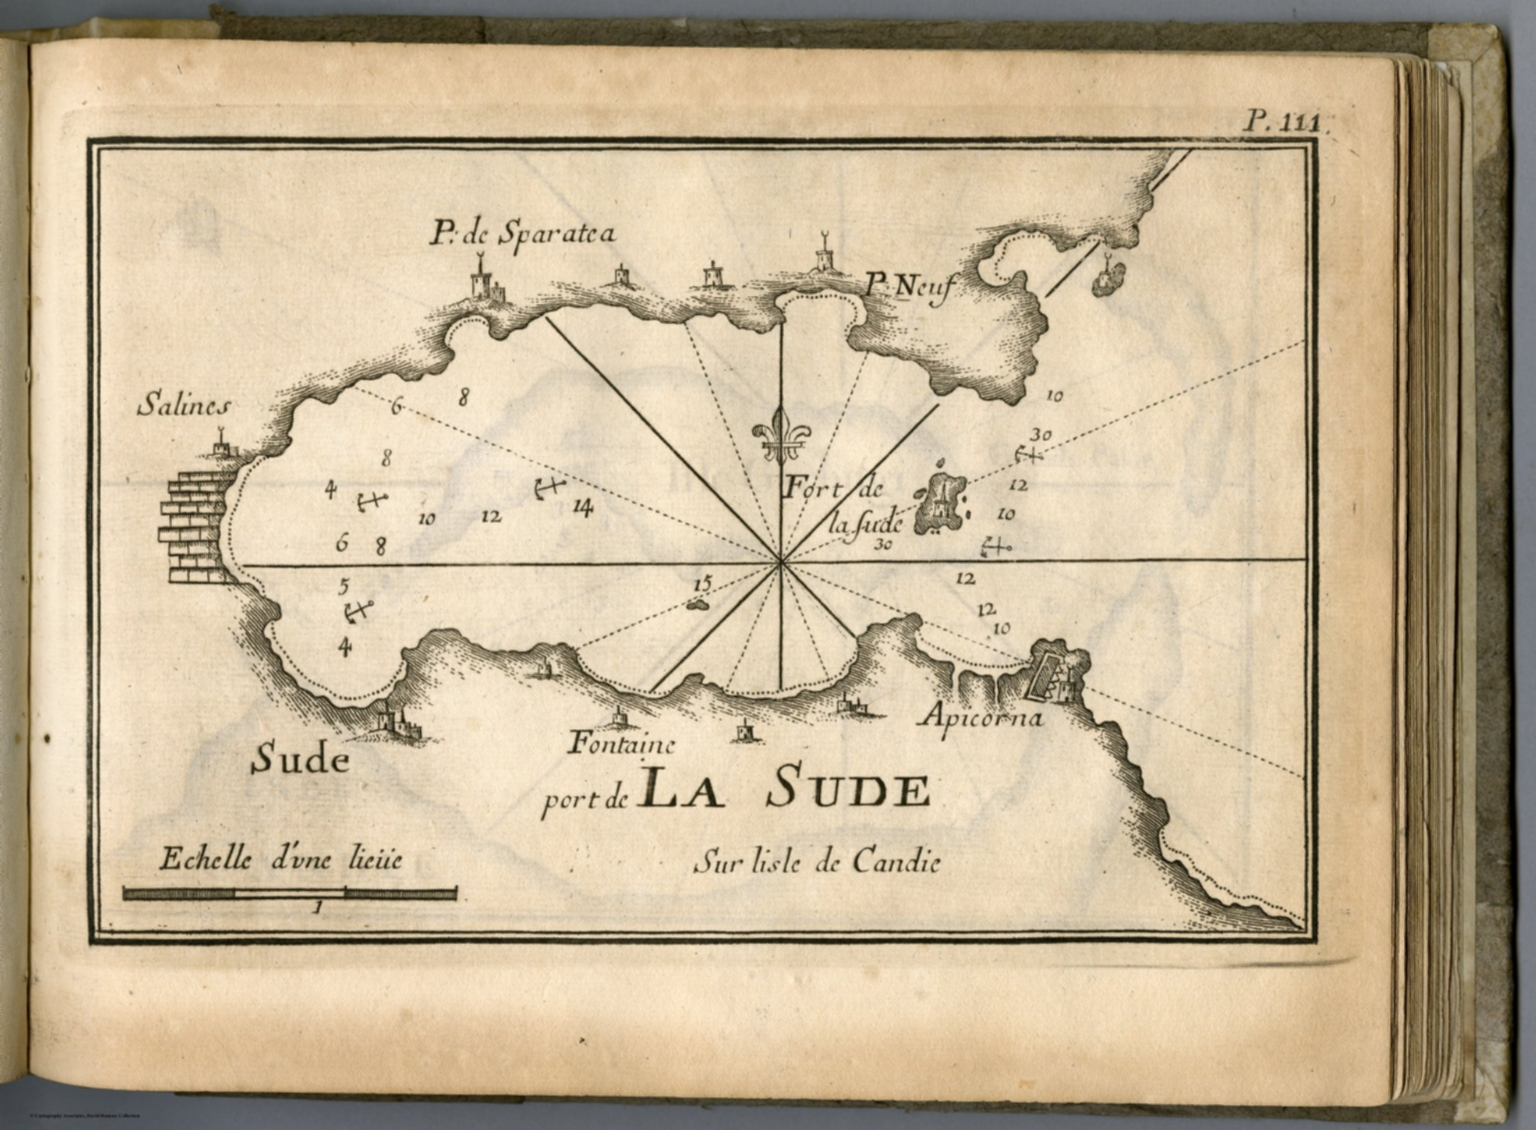 Pl 111 Souda Bay Crete Greece David Rumsey Historical Map